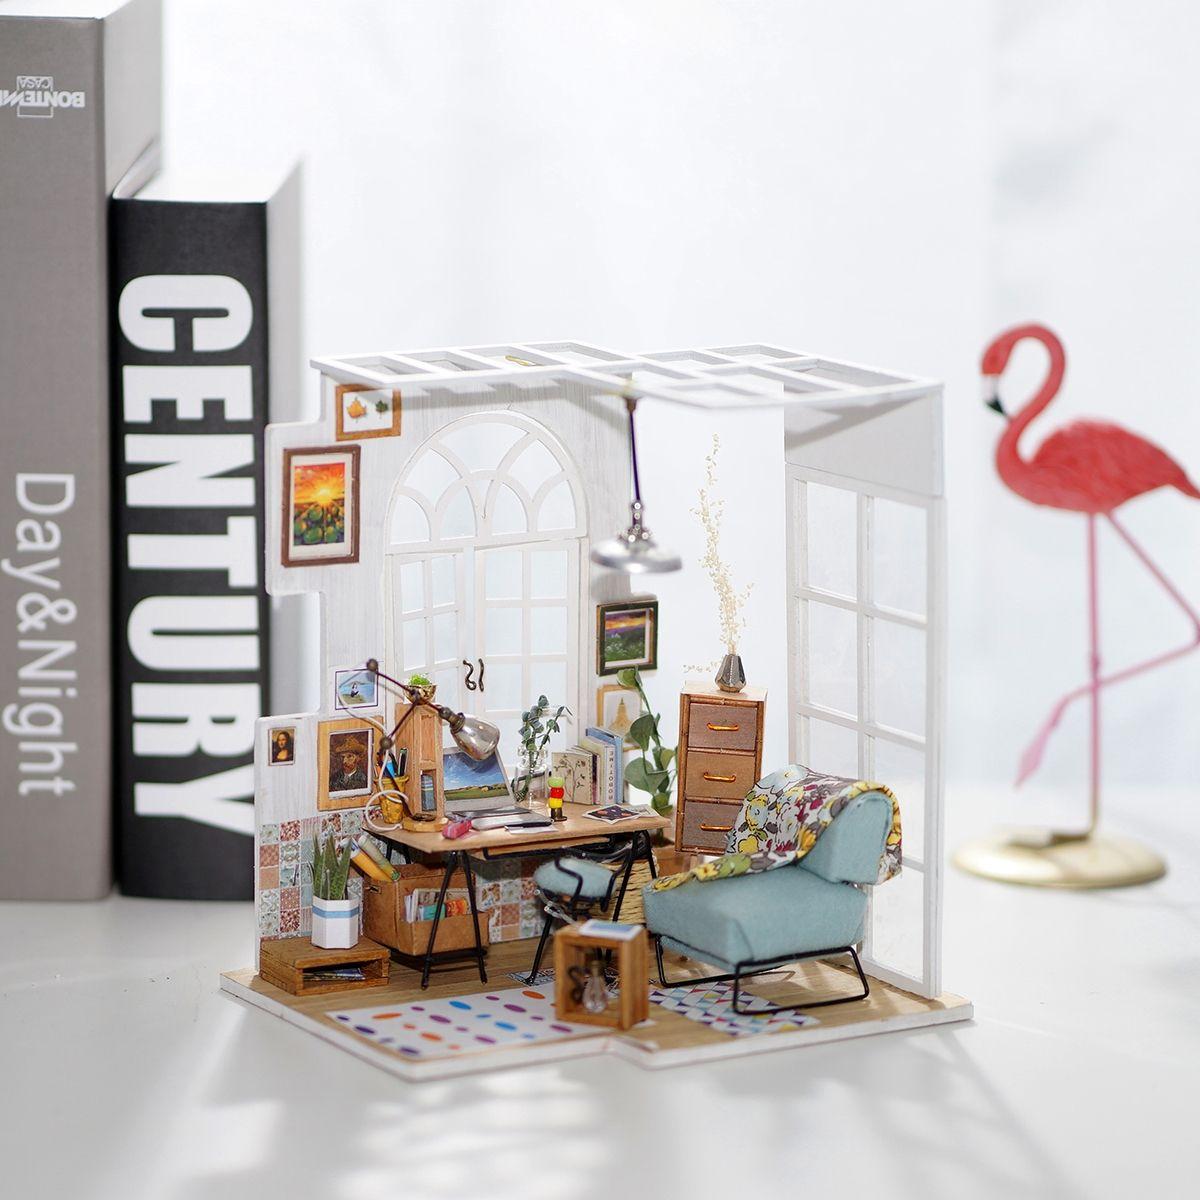 DIY Handmade Toy Miniature Doll House Kit 124 Wooden